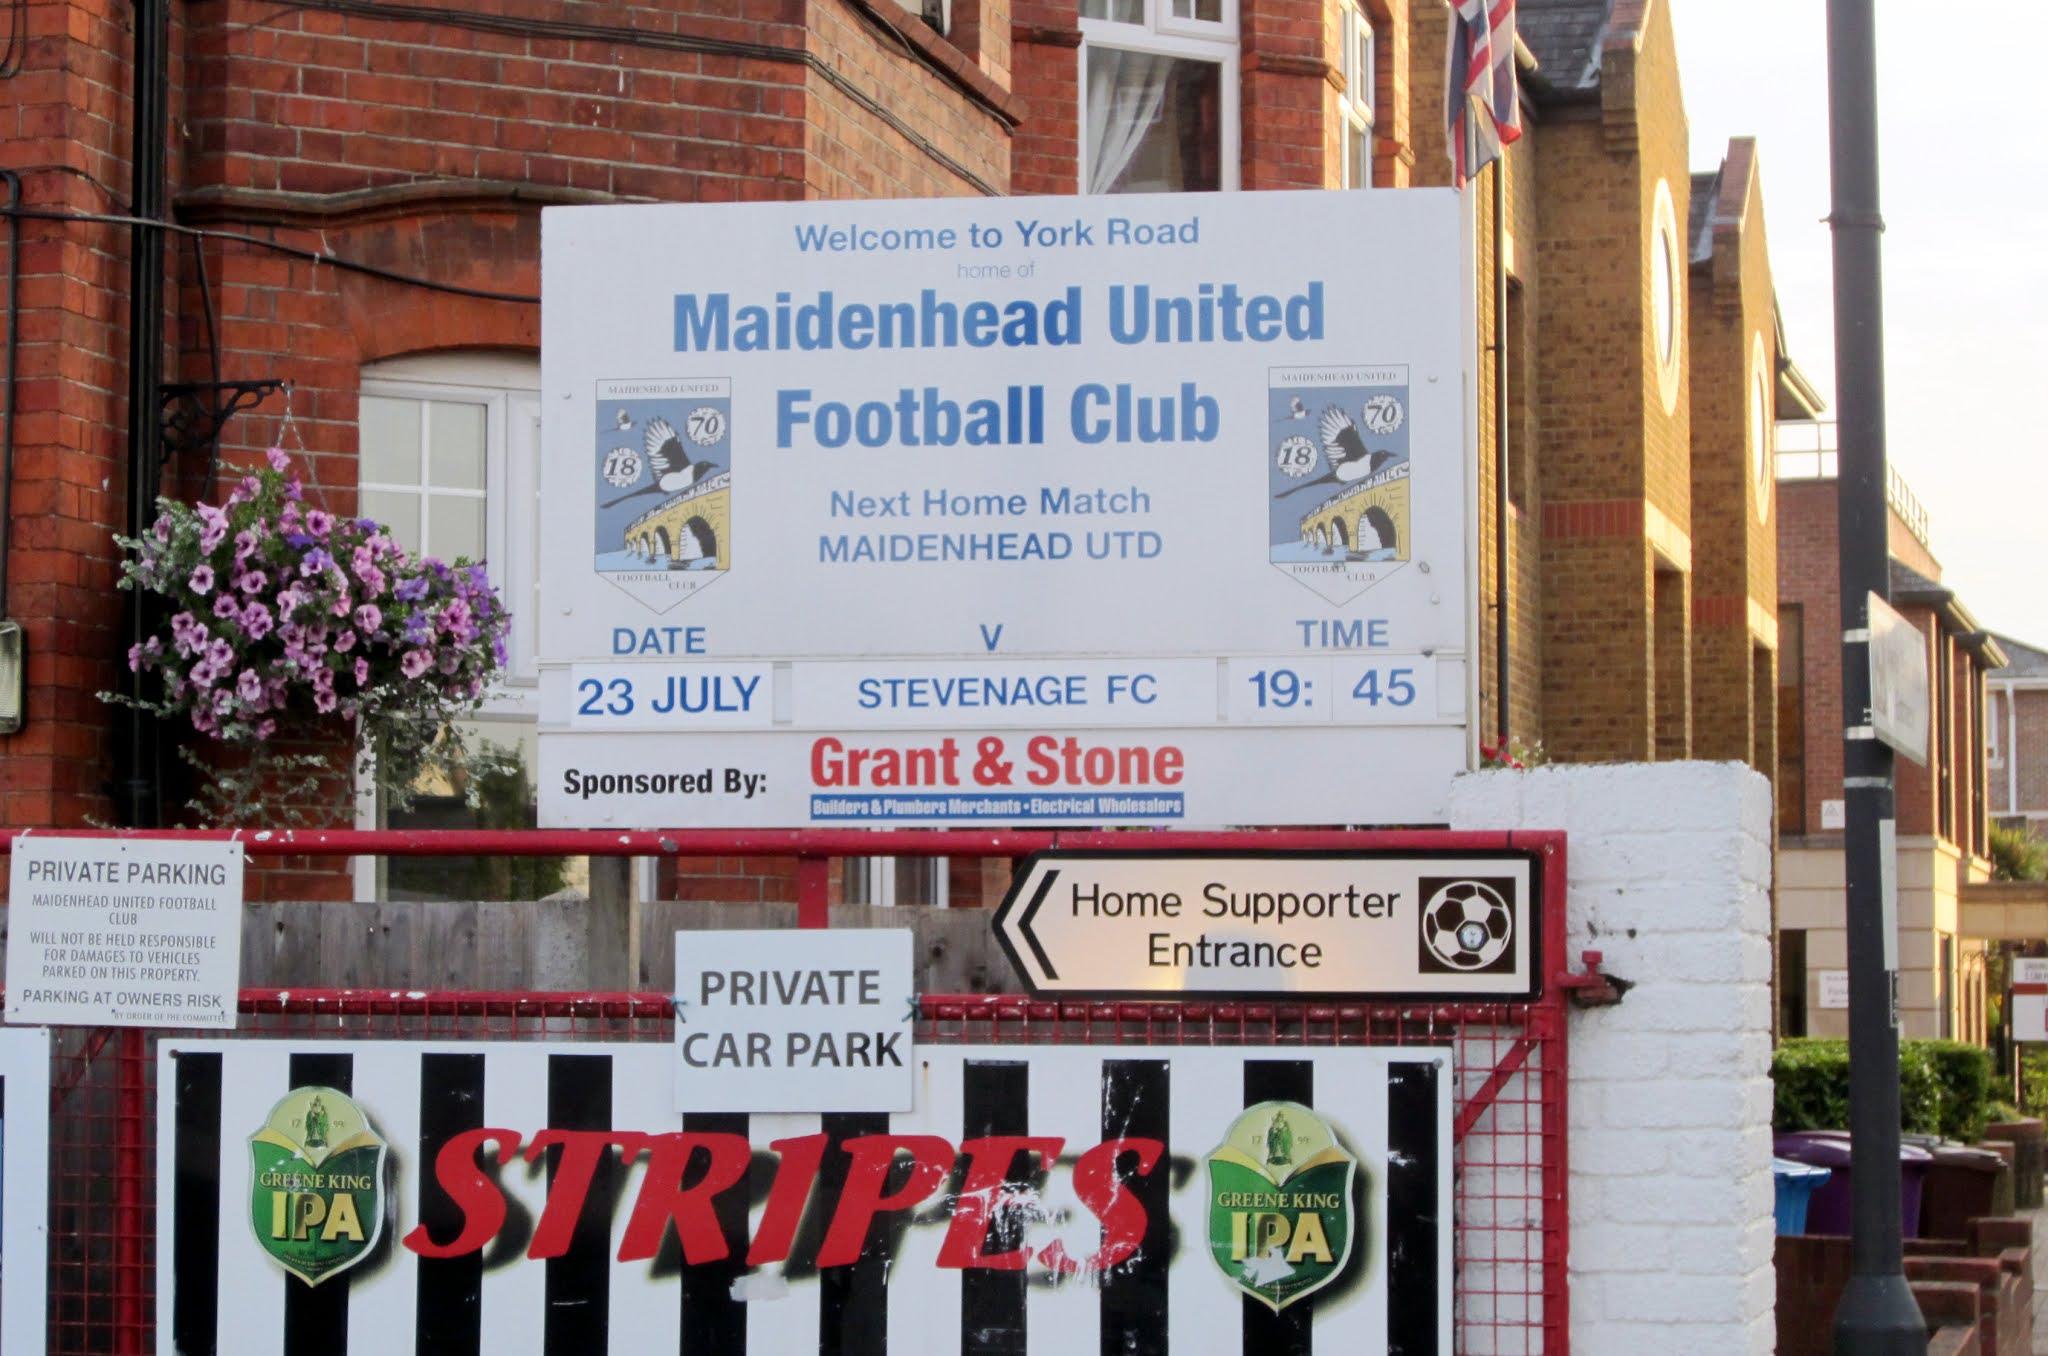 Sign outside the York Road football stadium